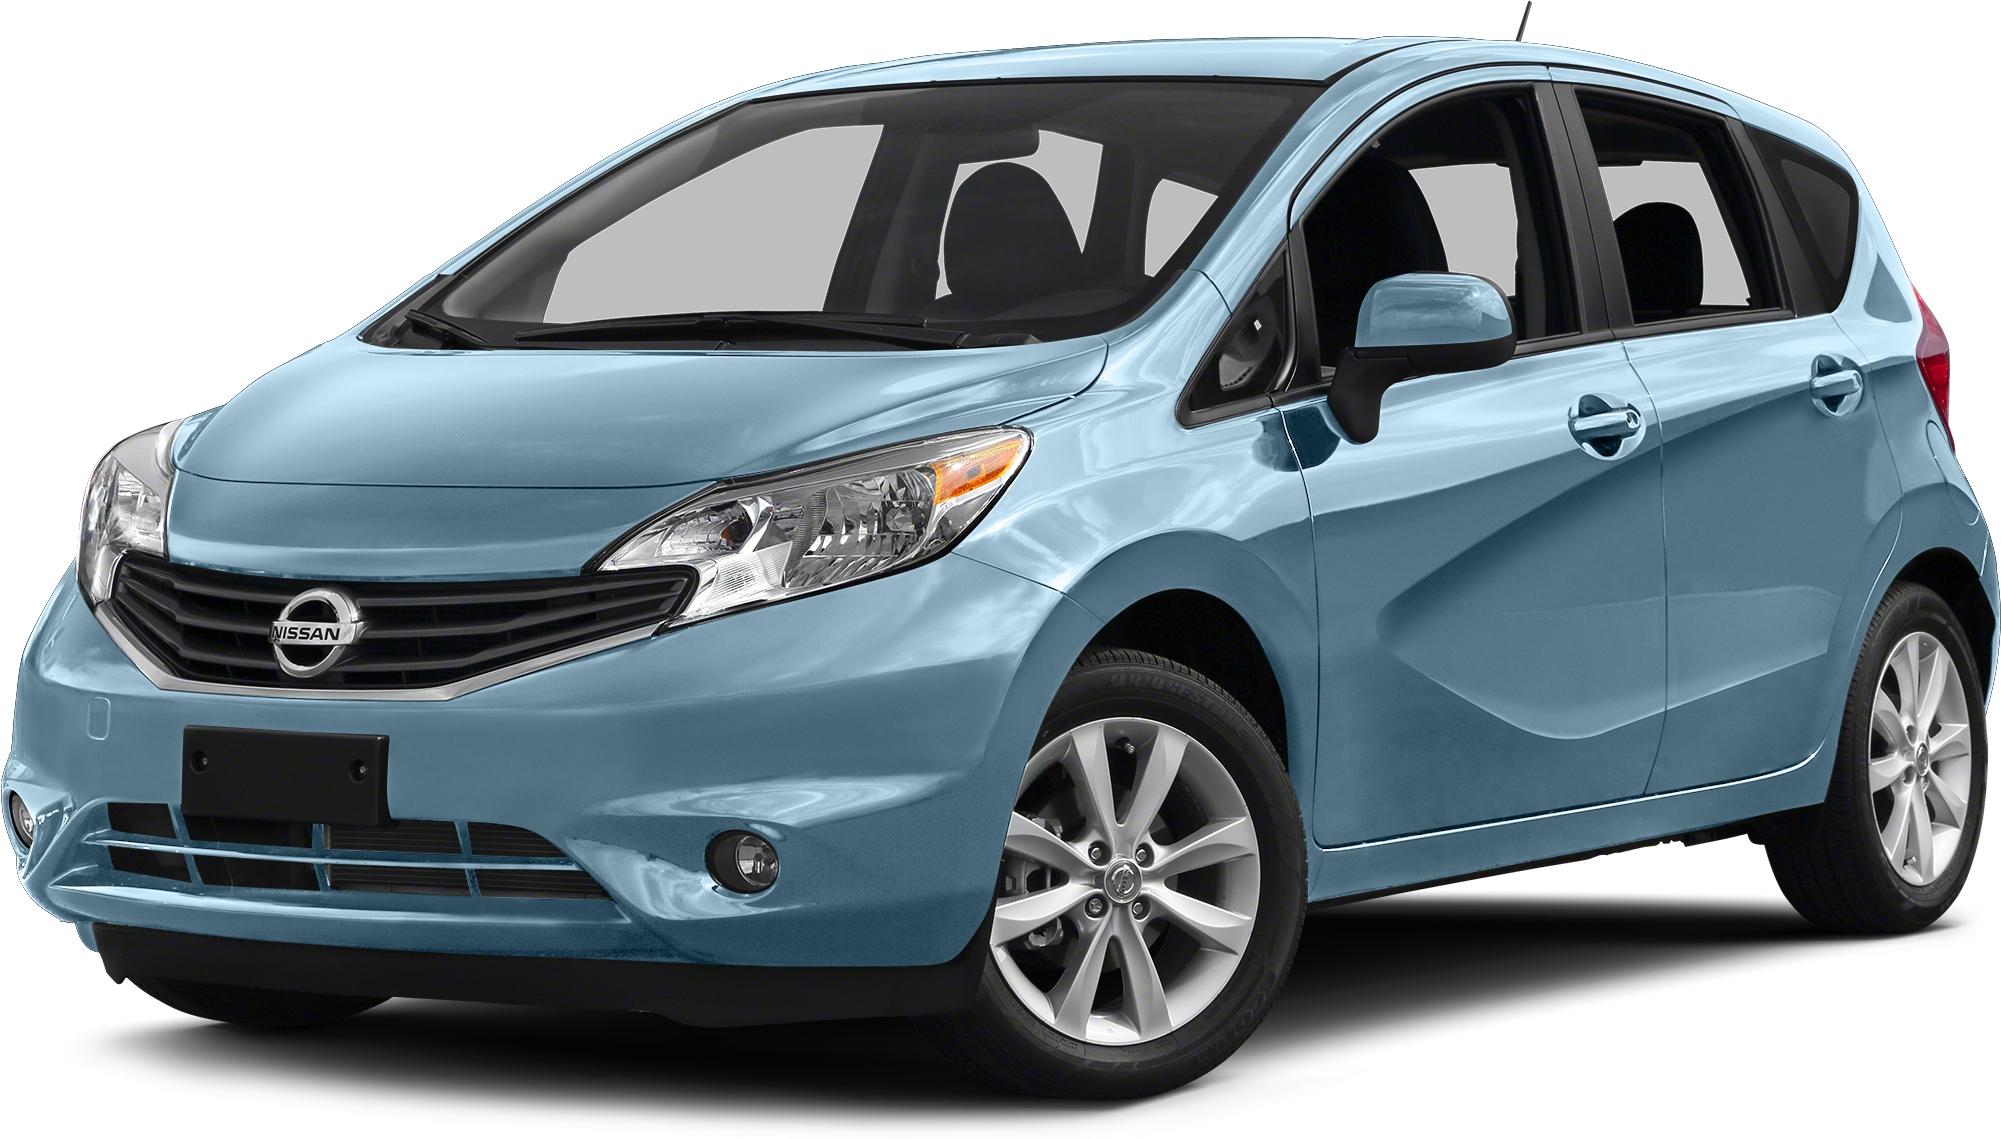 Honda odyssey lease austin 2017 2018 honda reviews for Honda minivan lease